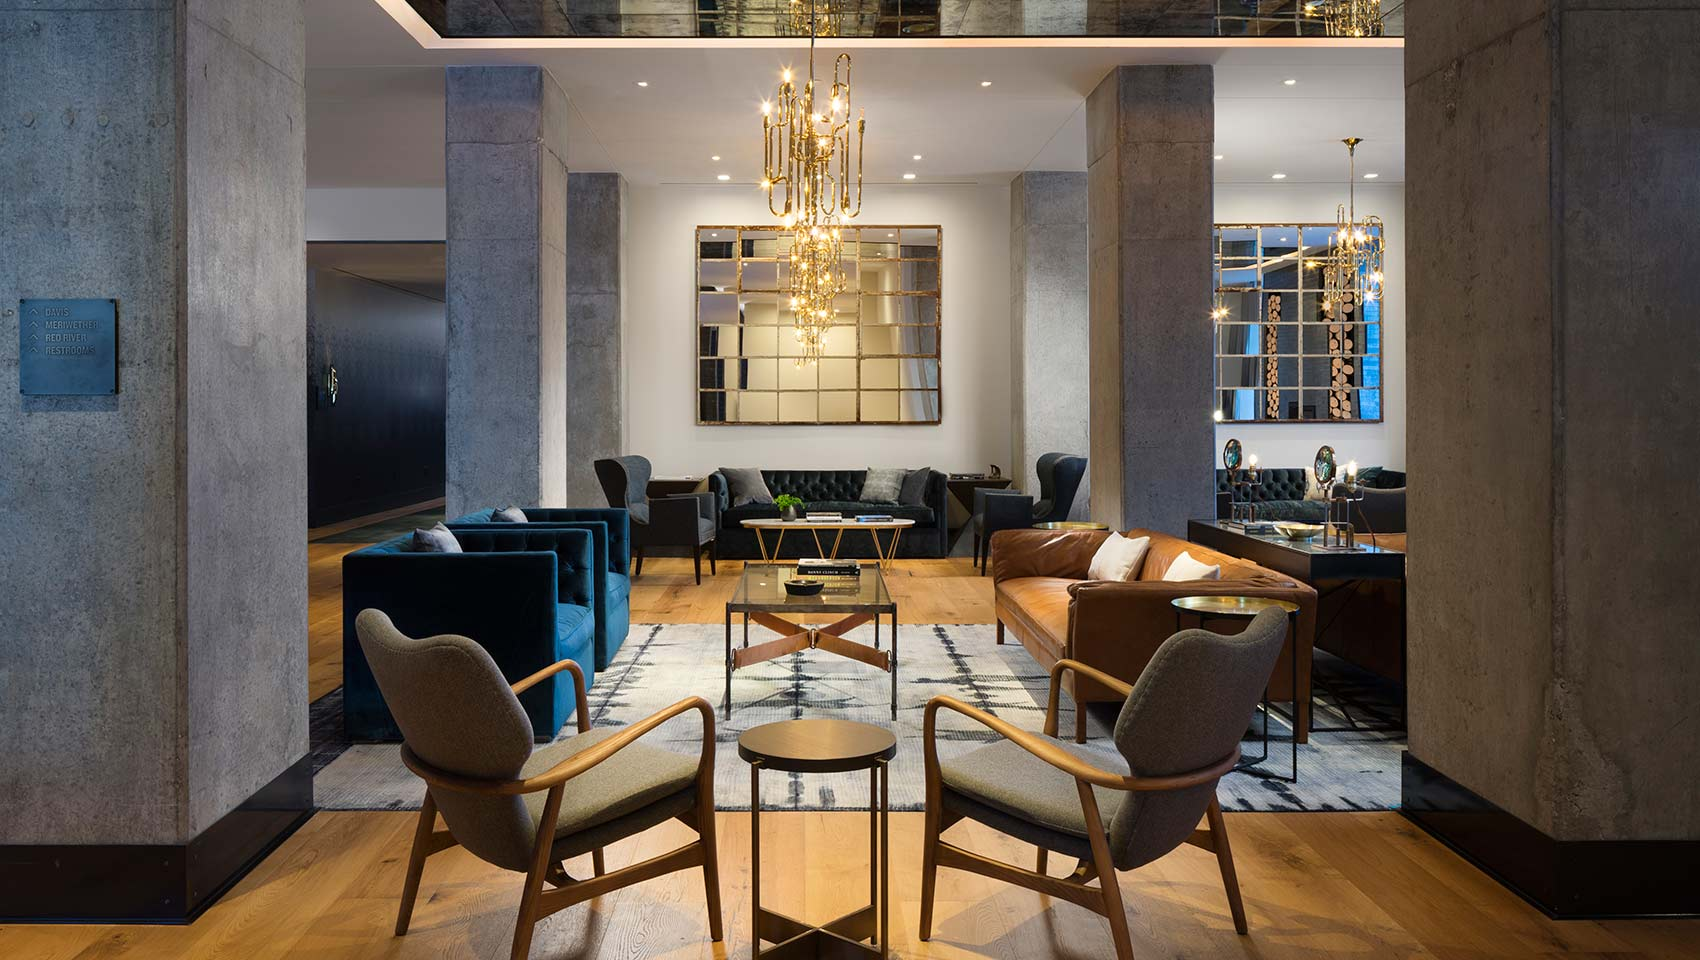 Photo: Hotel Van Zandt